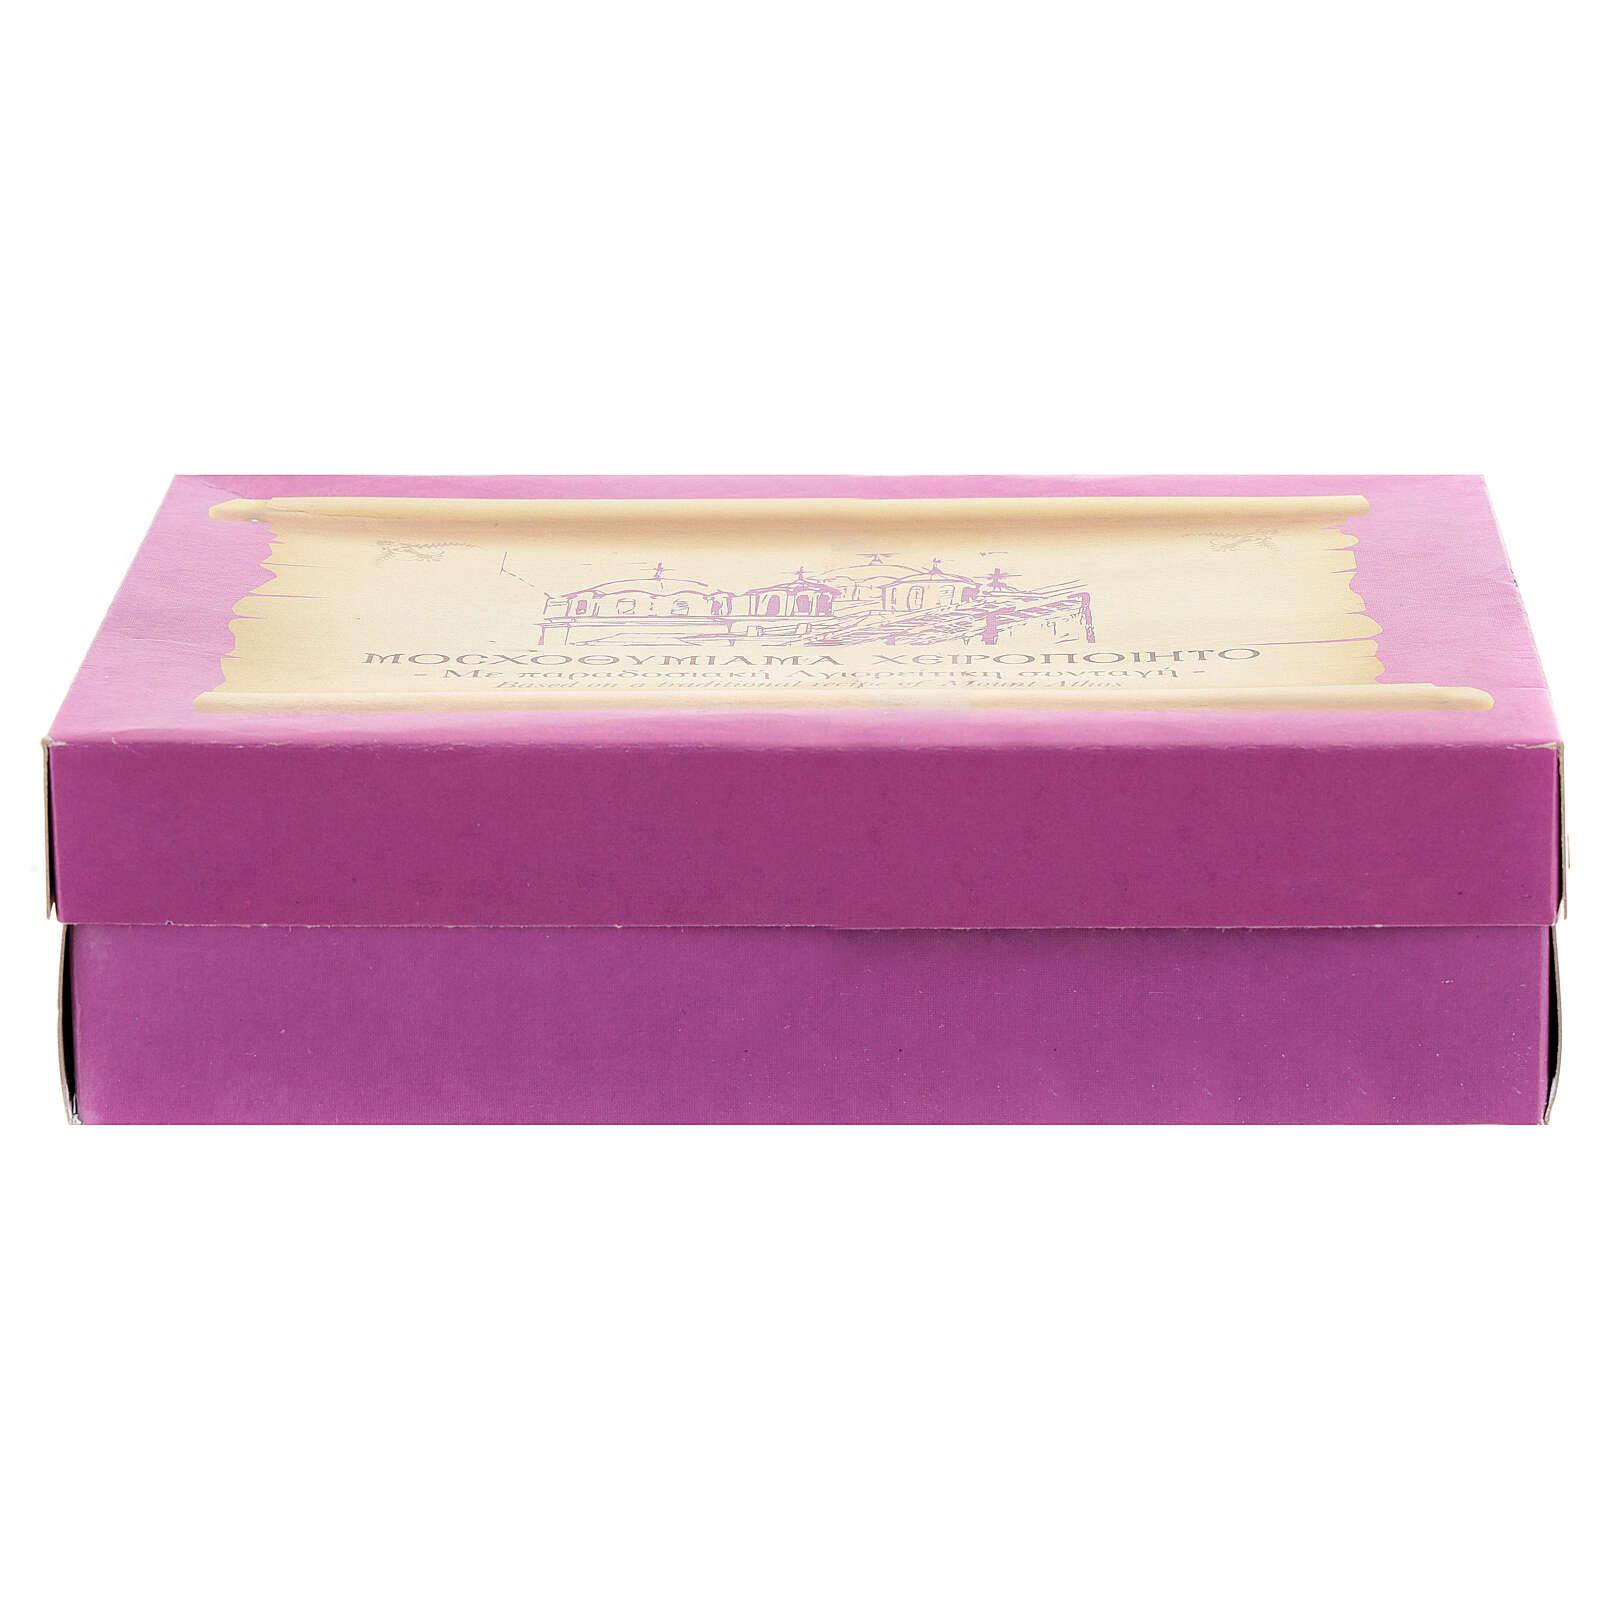 Incienso griego perfumado Violeta 1 Kg 3